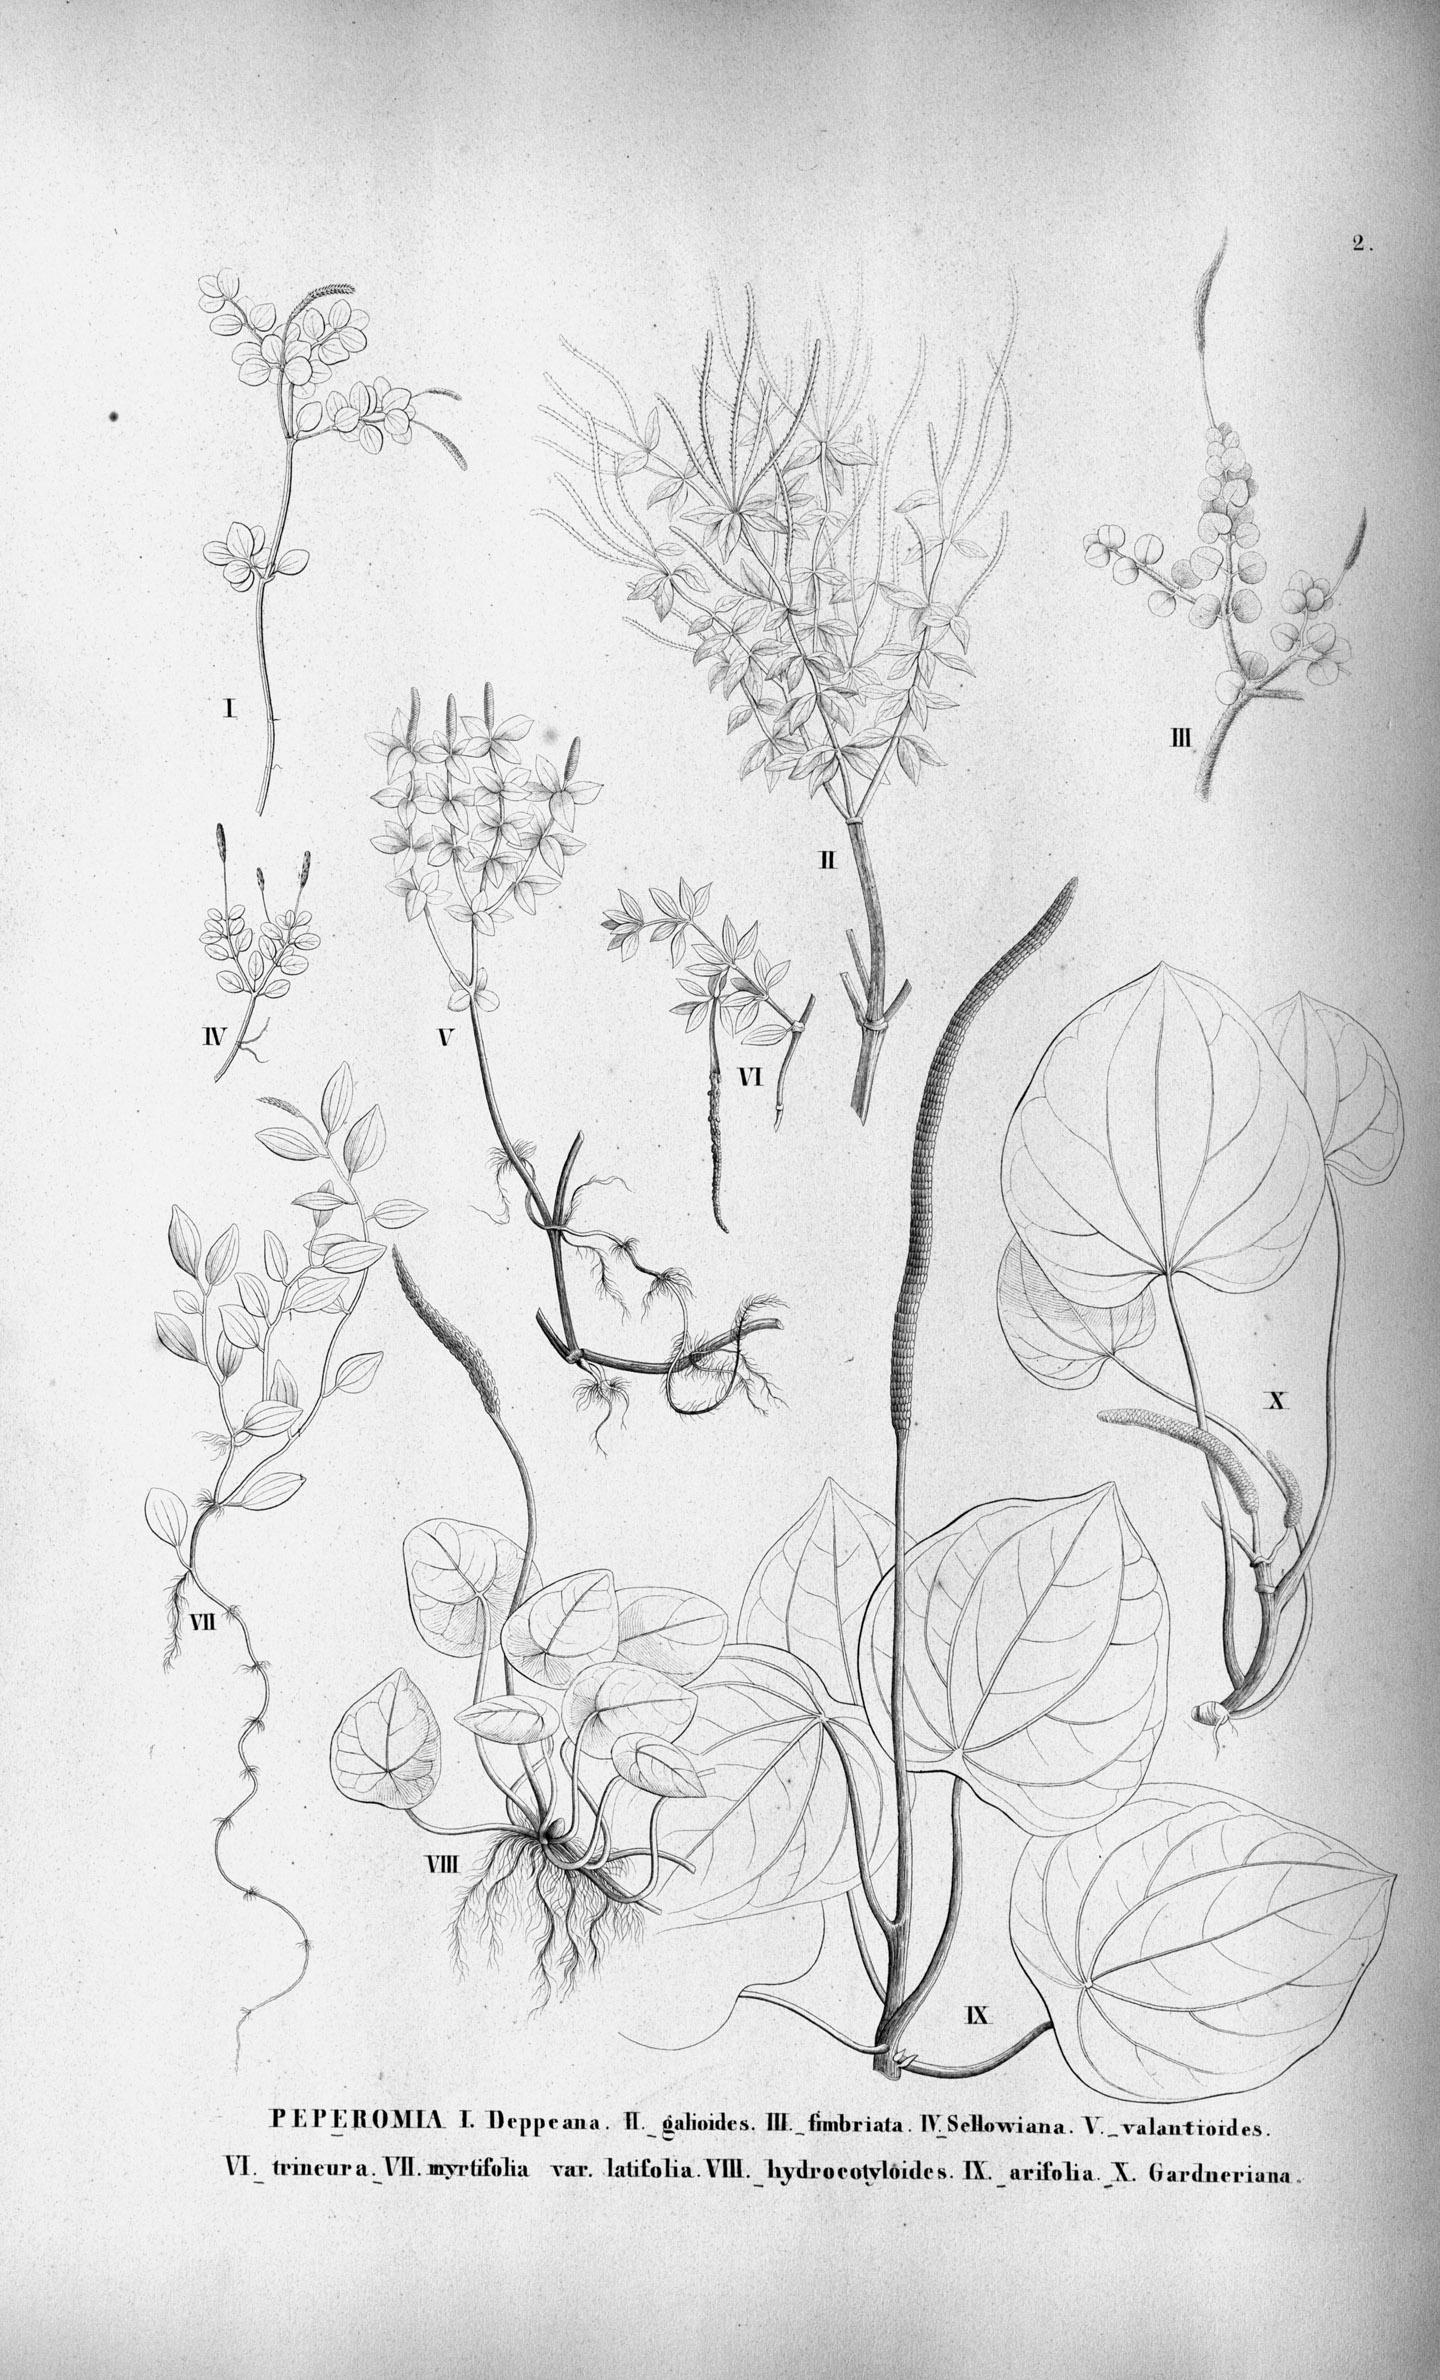 Peperomia myrtifolia